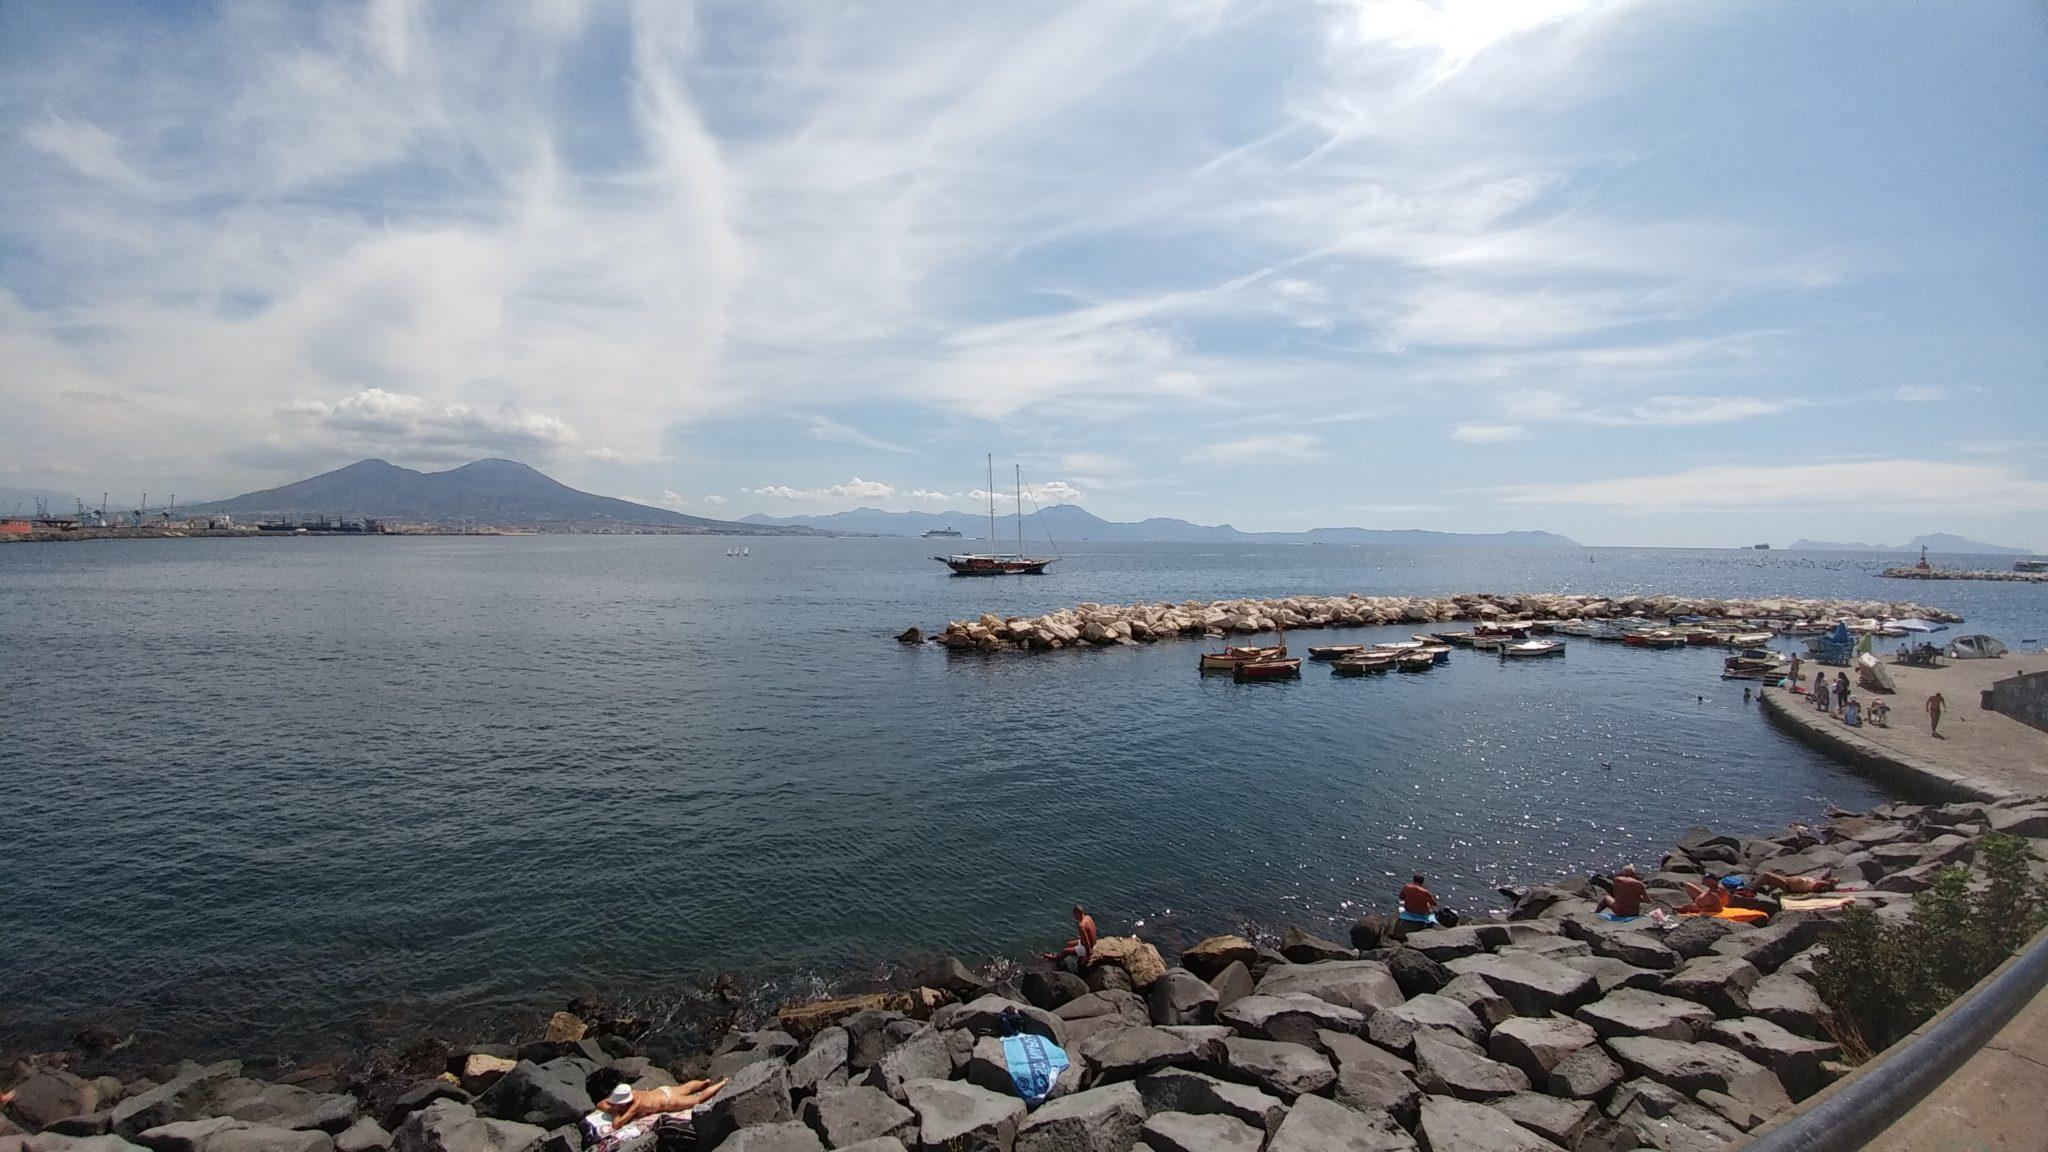 Napoli 02